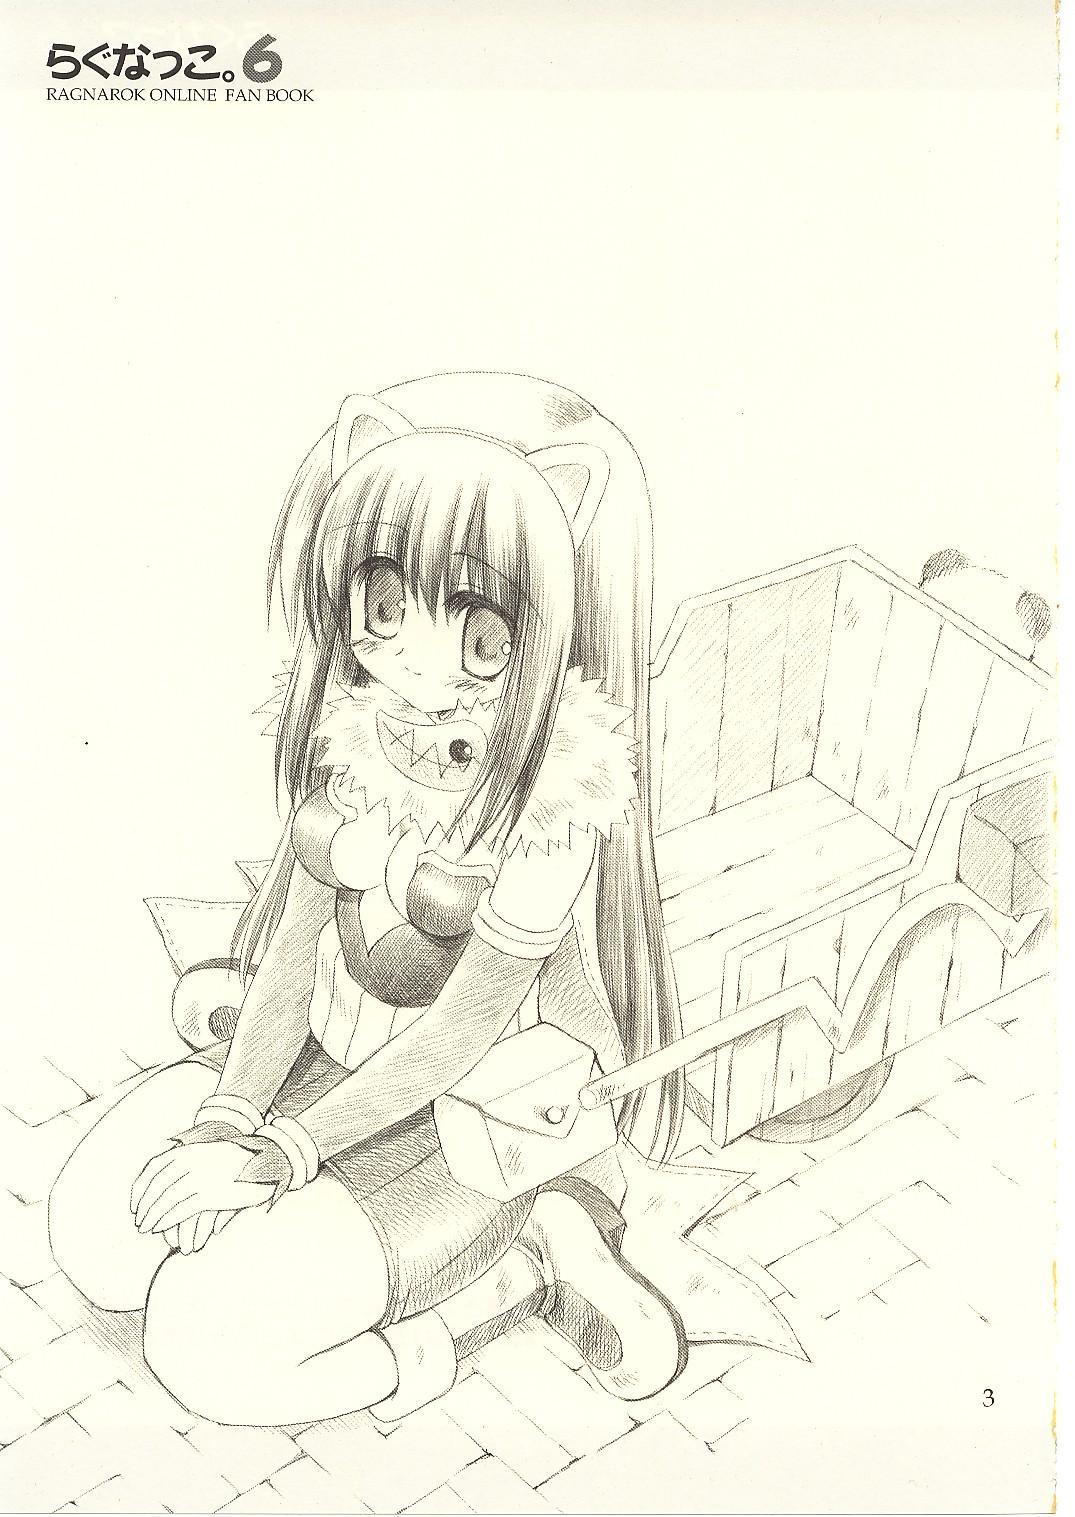 Ragnakko 6 1